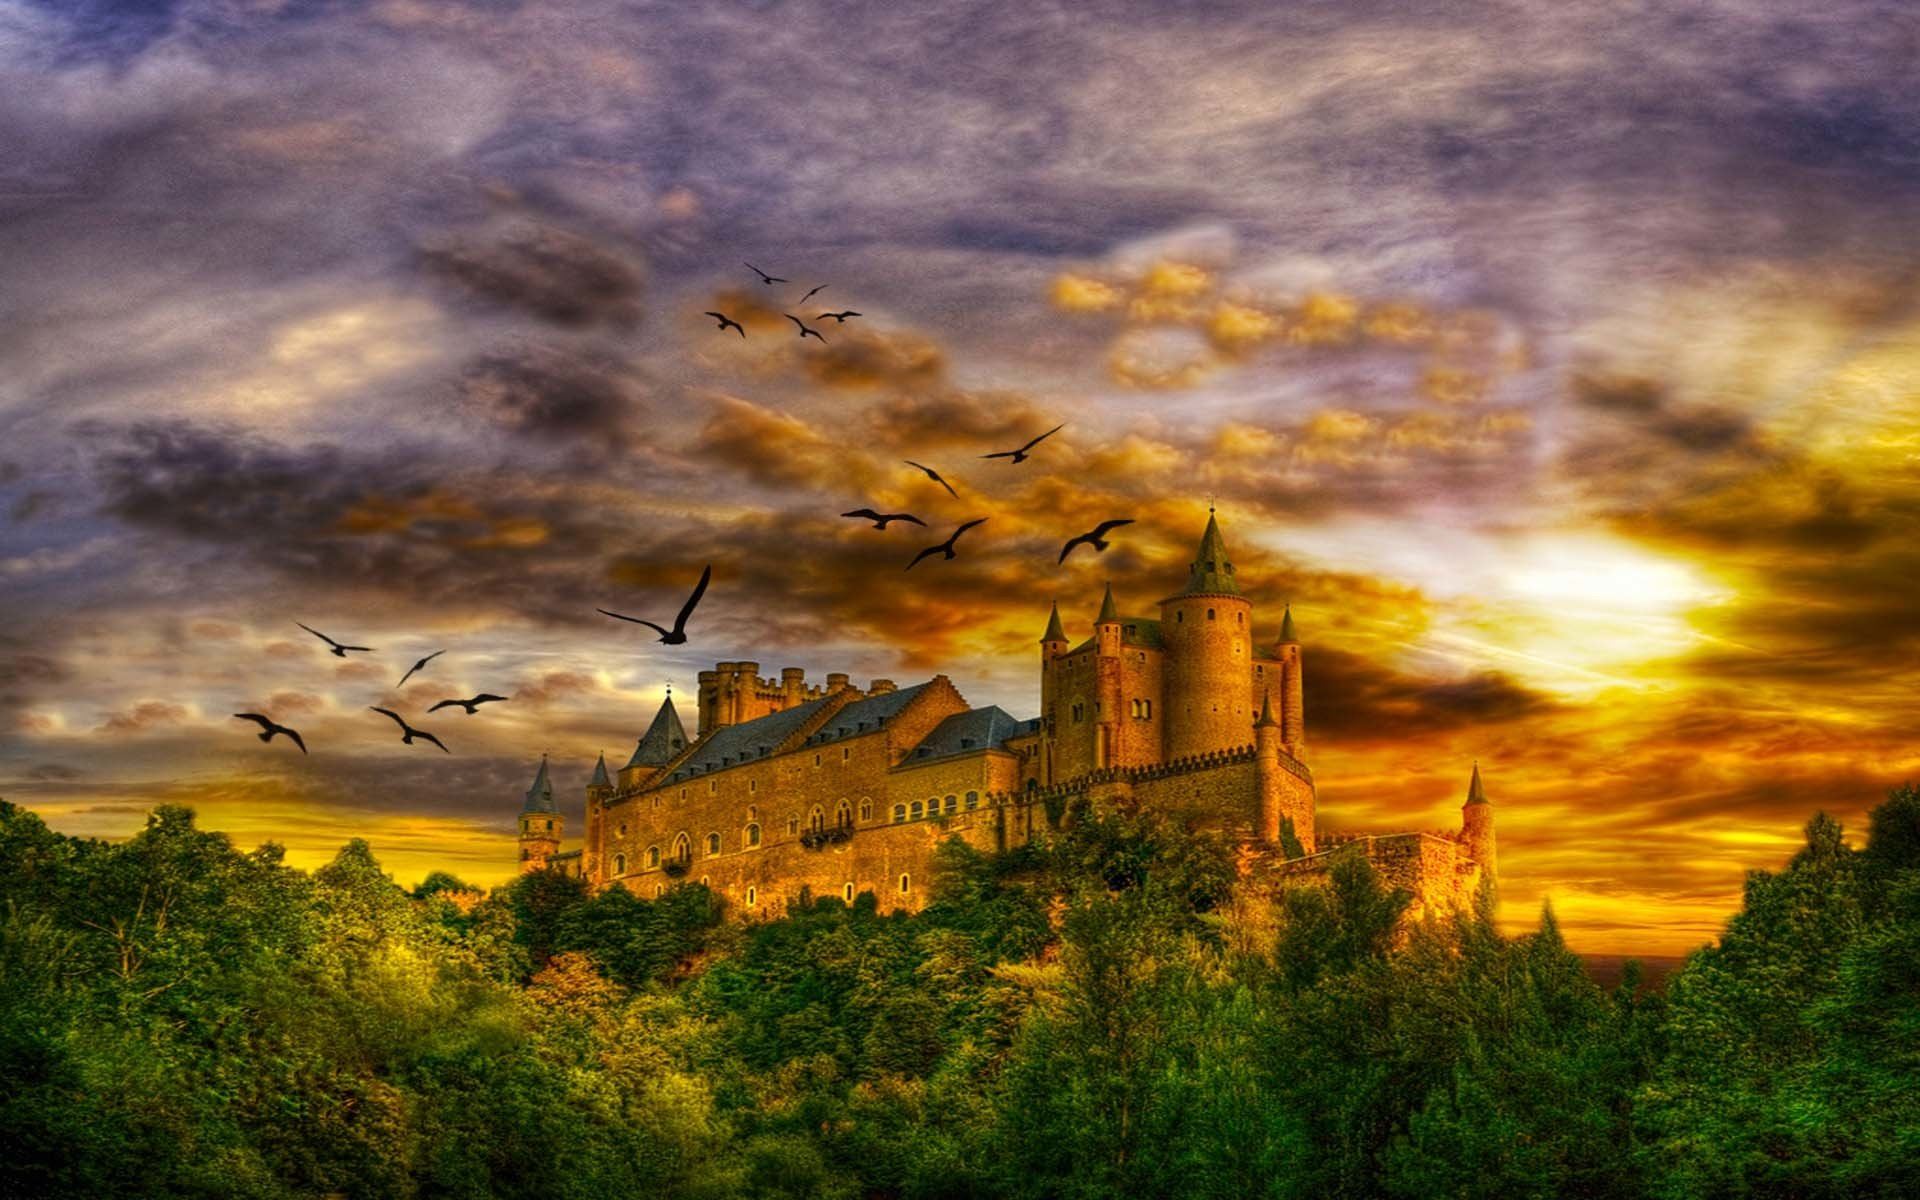 Fantasy - Slott  Magnificent Castle Bakgrund